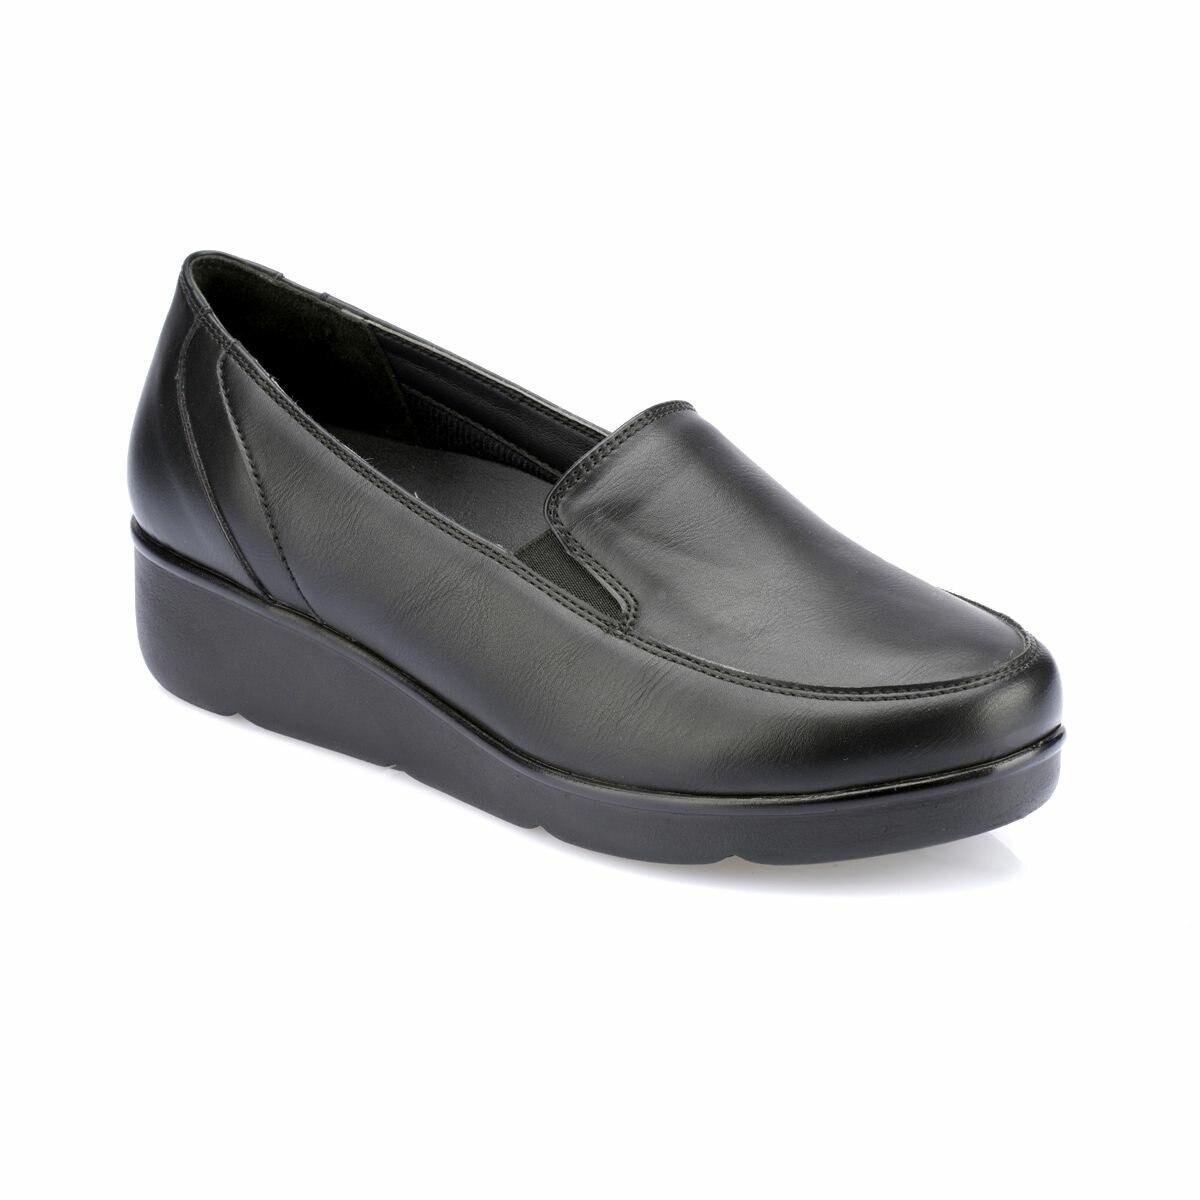 FLO 82.100110.Z Black Women Shoes Polaris 5 Point